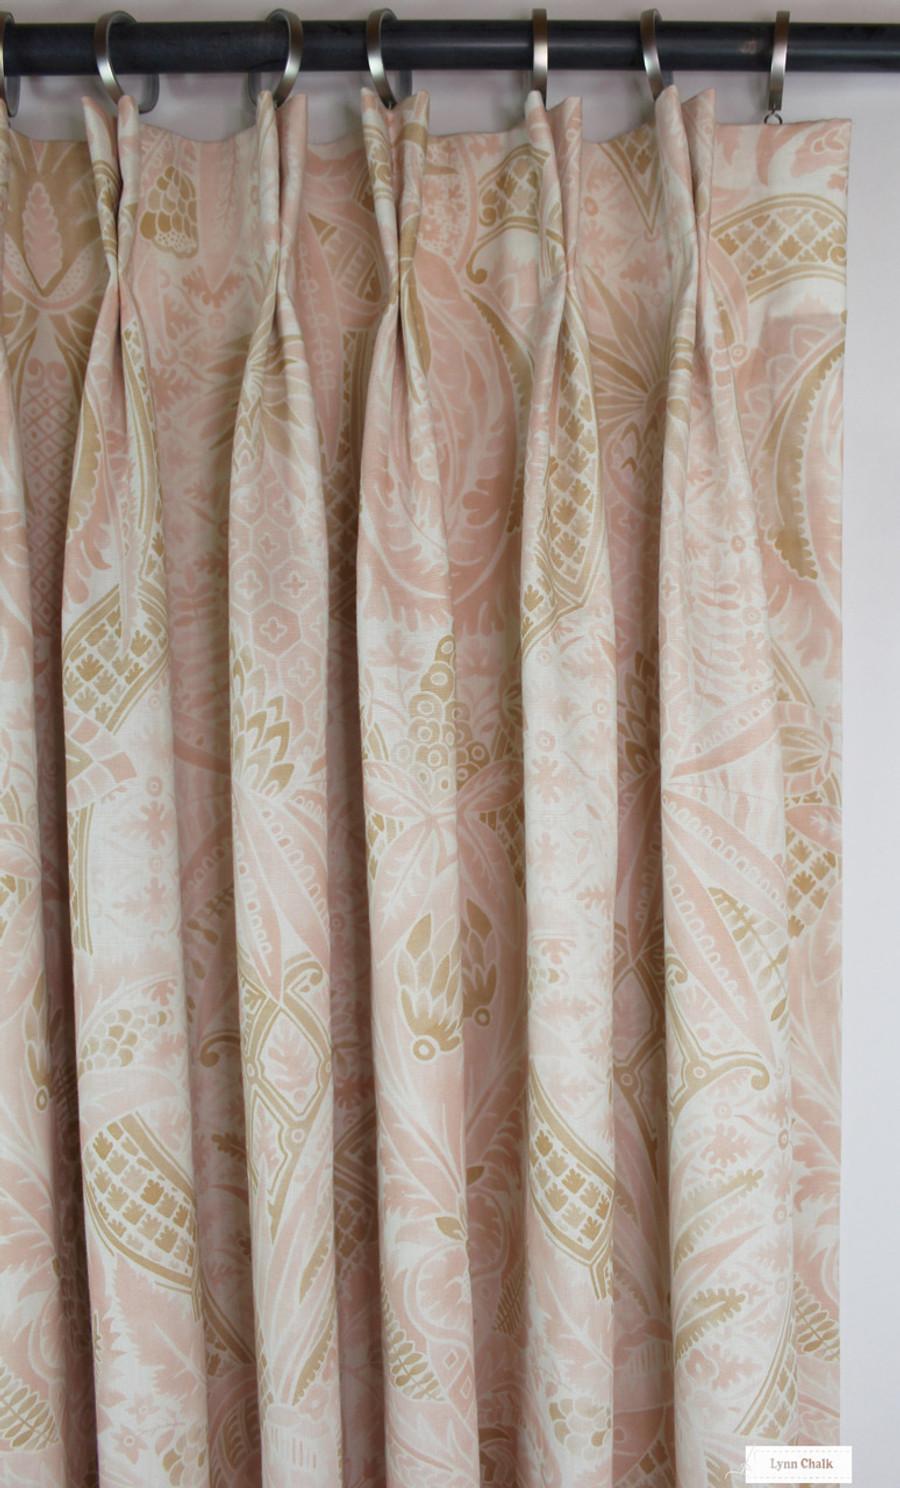 Custom Drapes in Cap Ferrat Blush